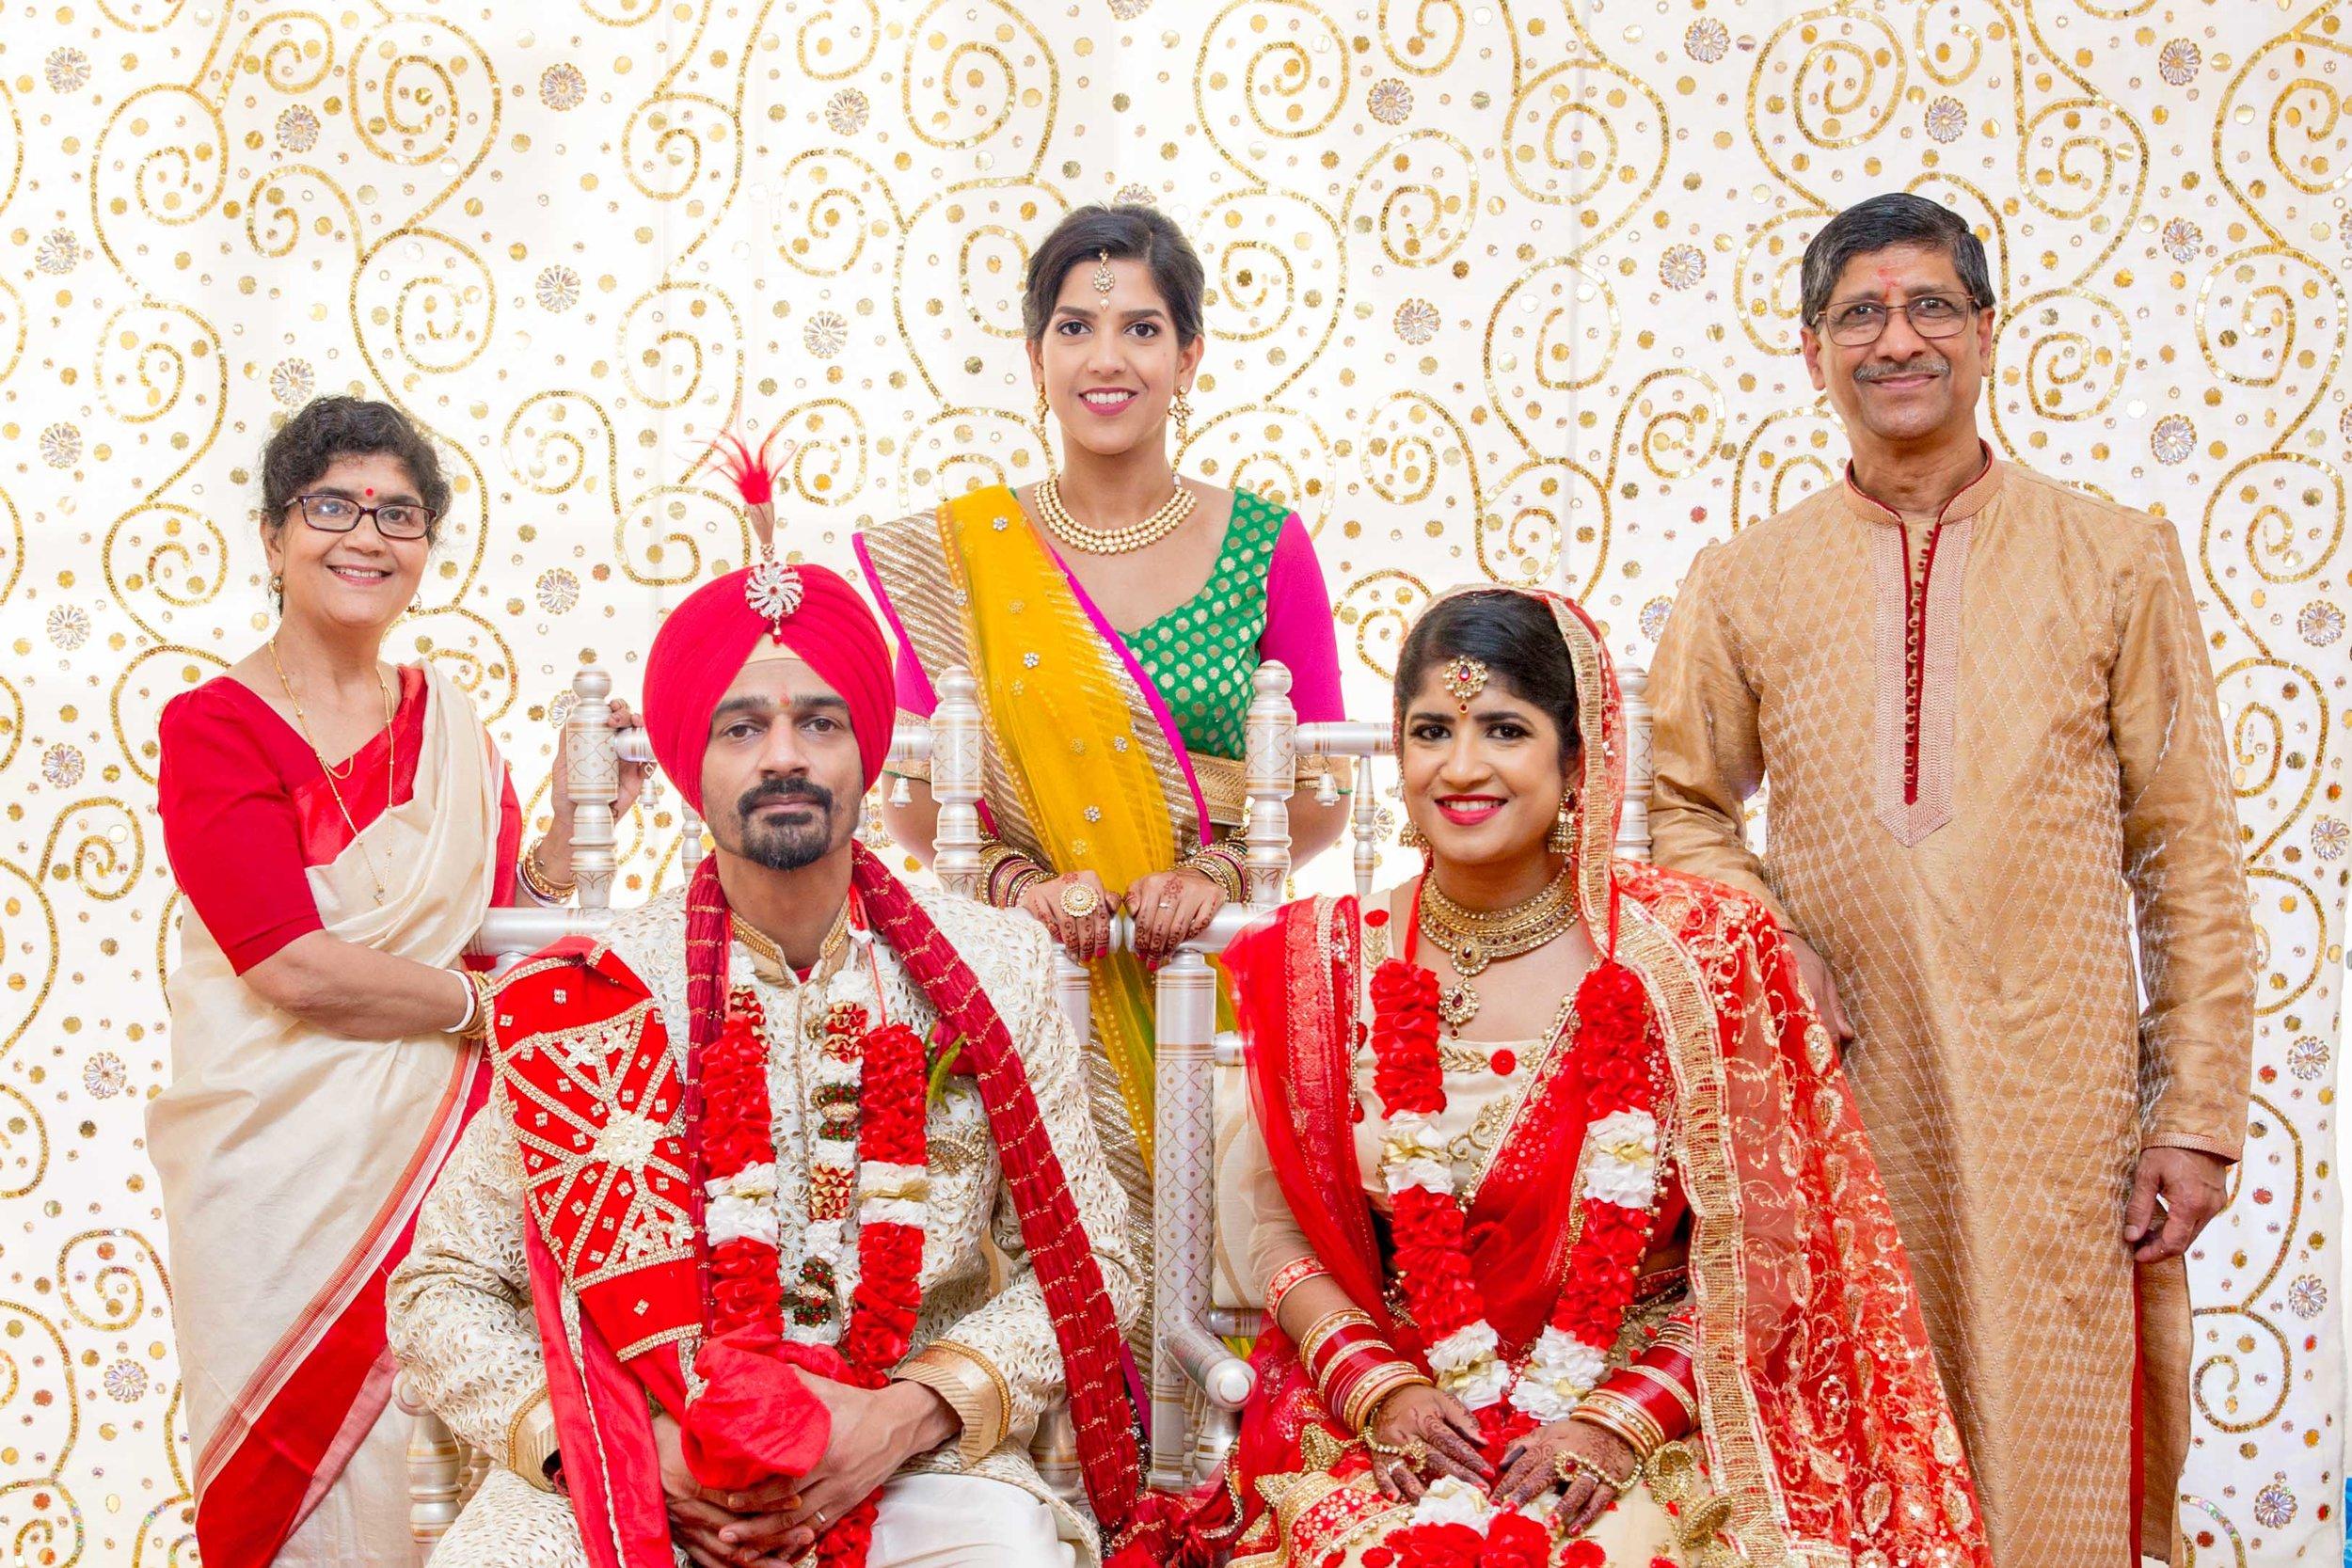 ramada-park-hall-hotel-birmingham-wolverhampton-hindu-wedding-asian-wedding-photography-natalia-smith-photography-28.jpg